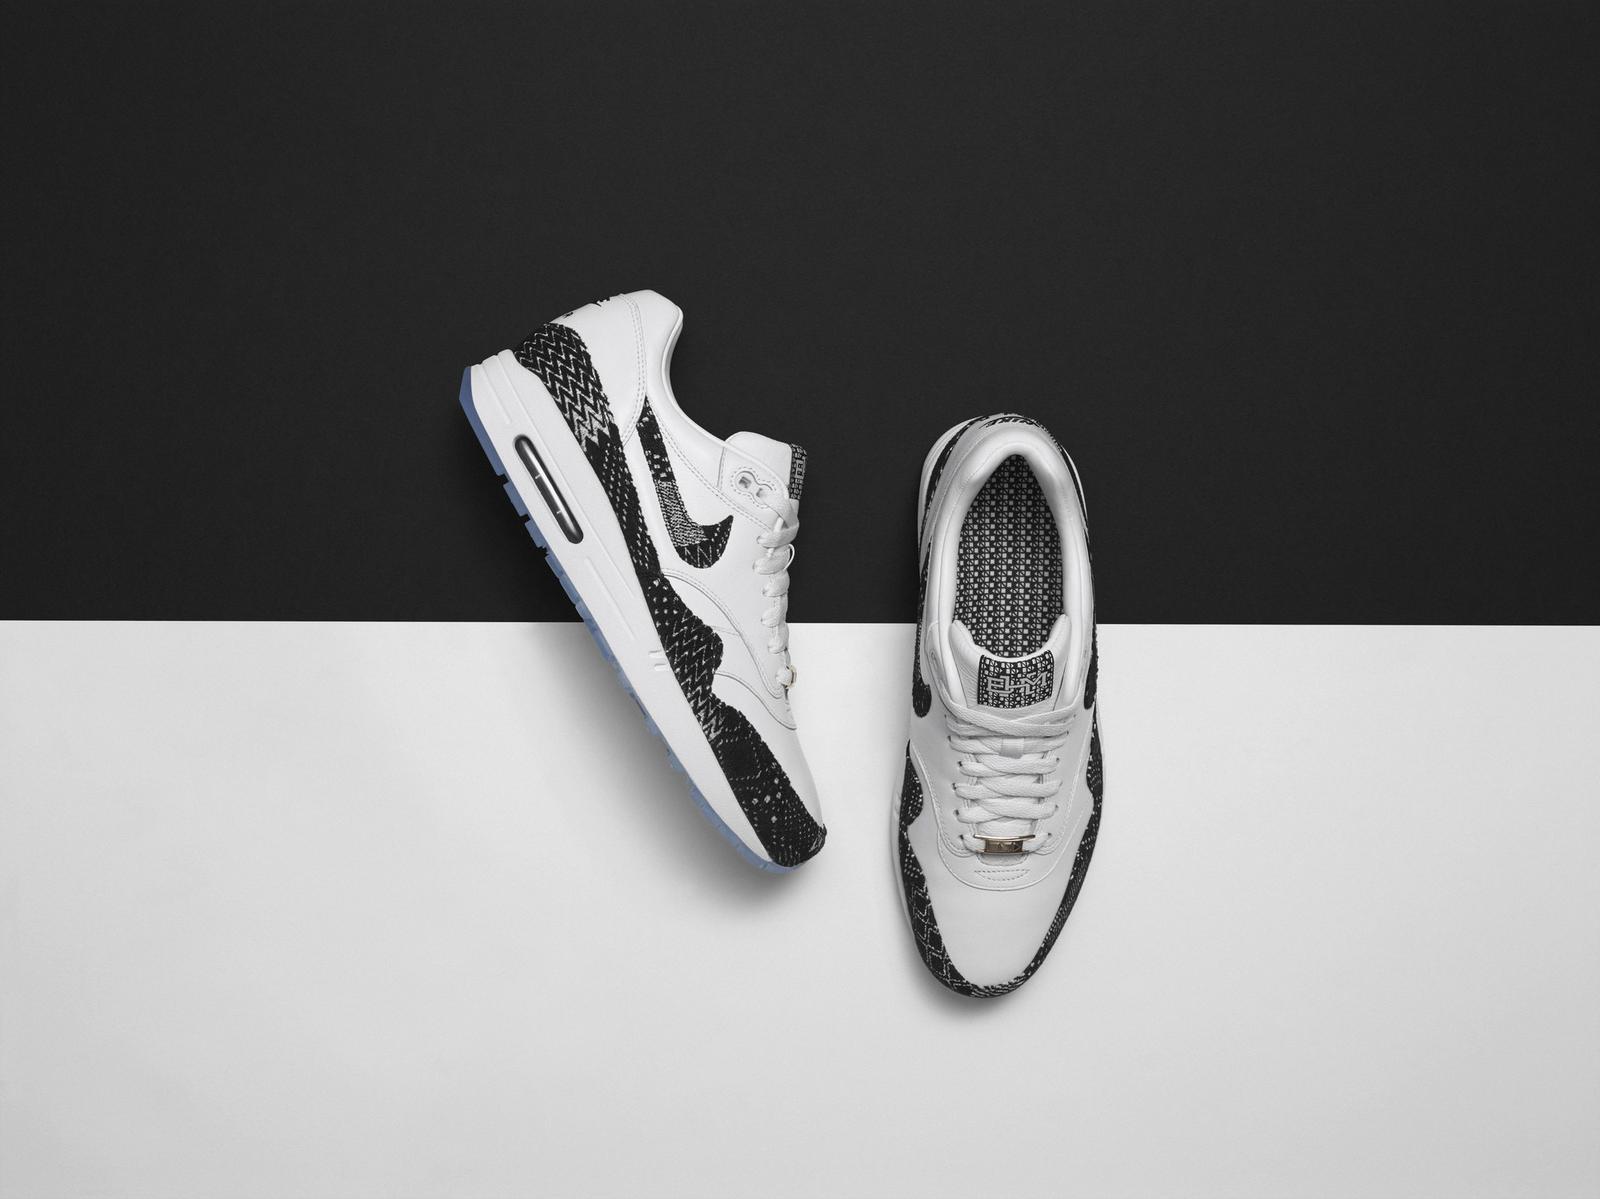 Nike_SP15_BHM_FTWR_MNS_AMX1_Final_native_1600